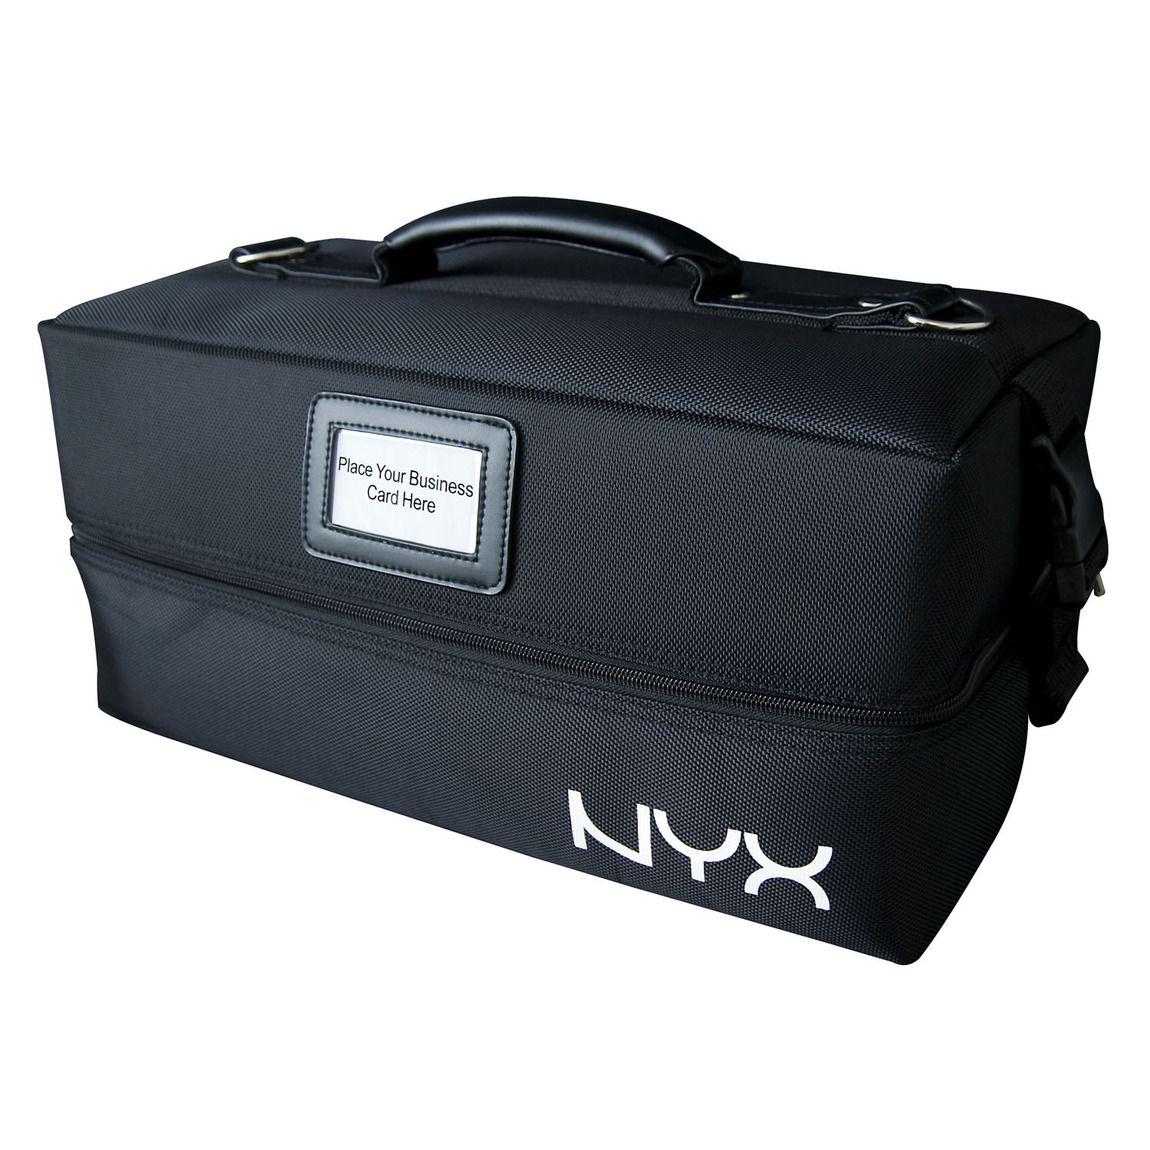 Image result for nyx soft train case Makeup artist